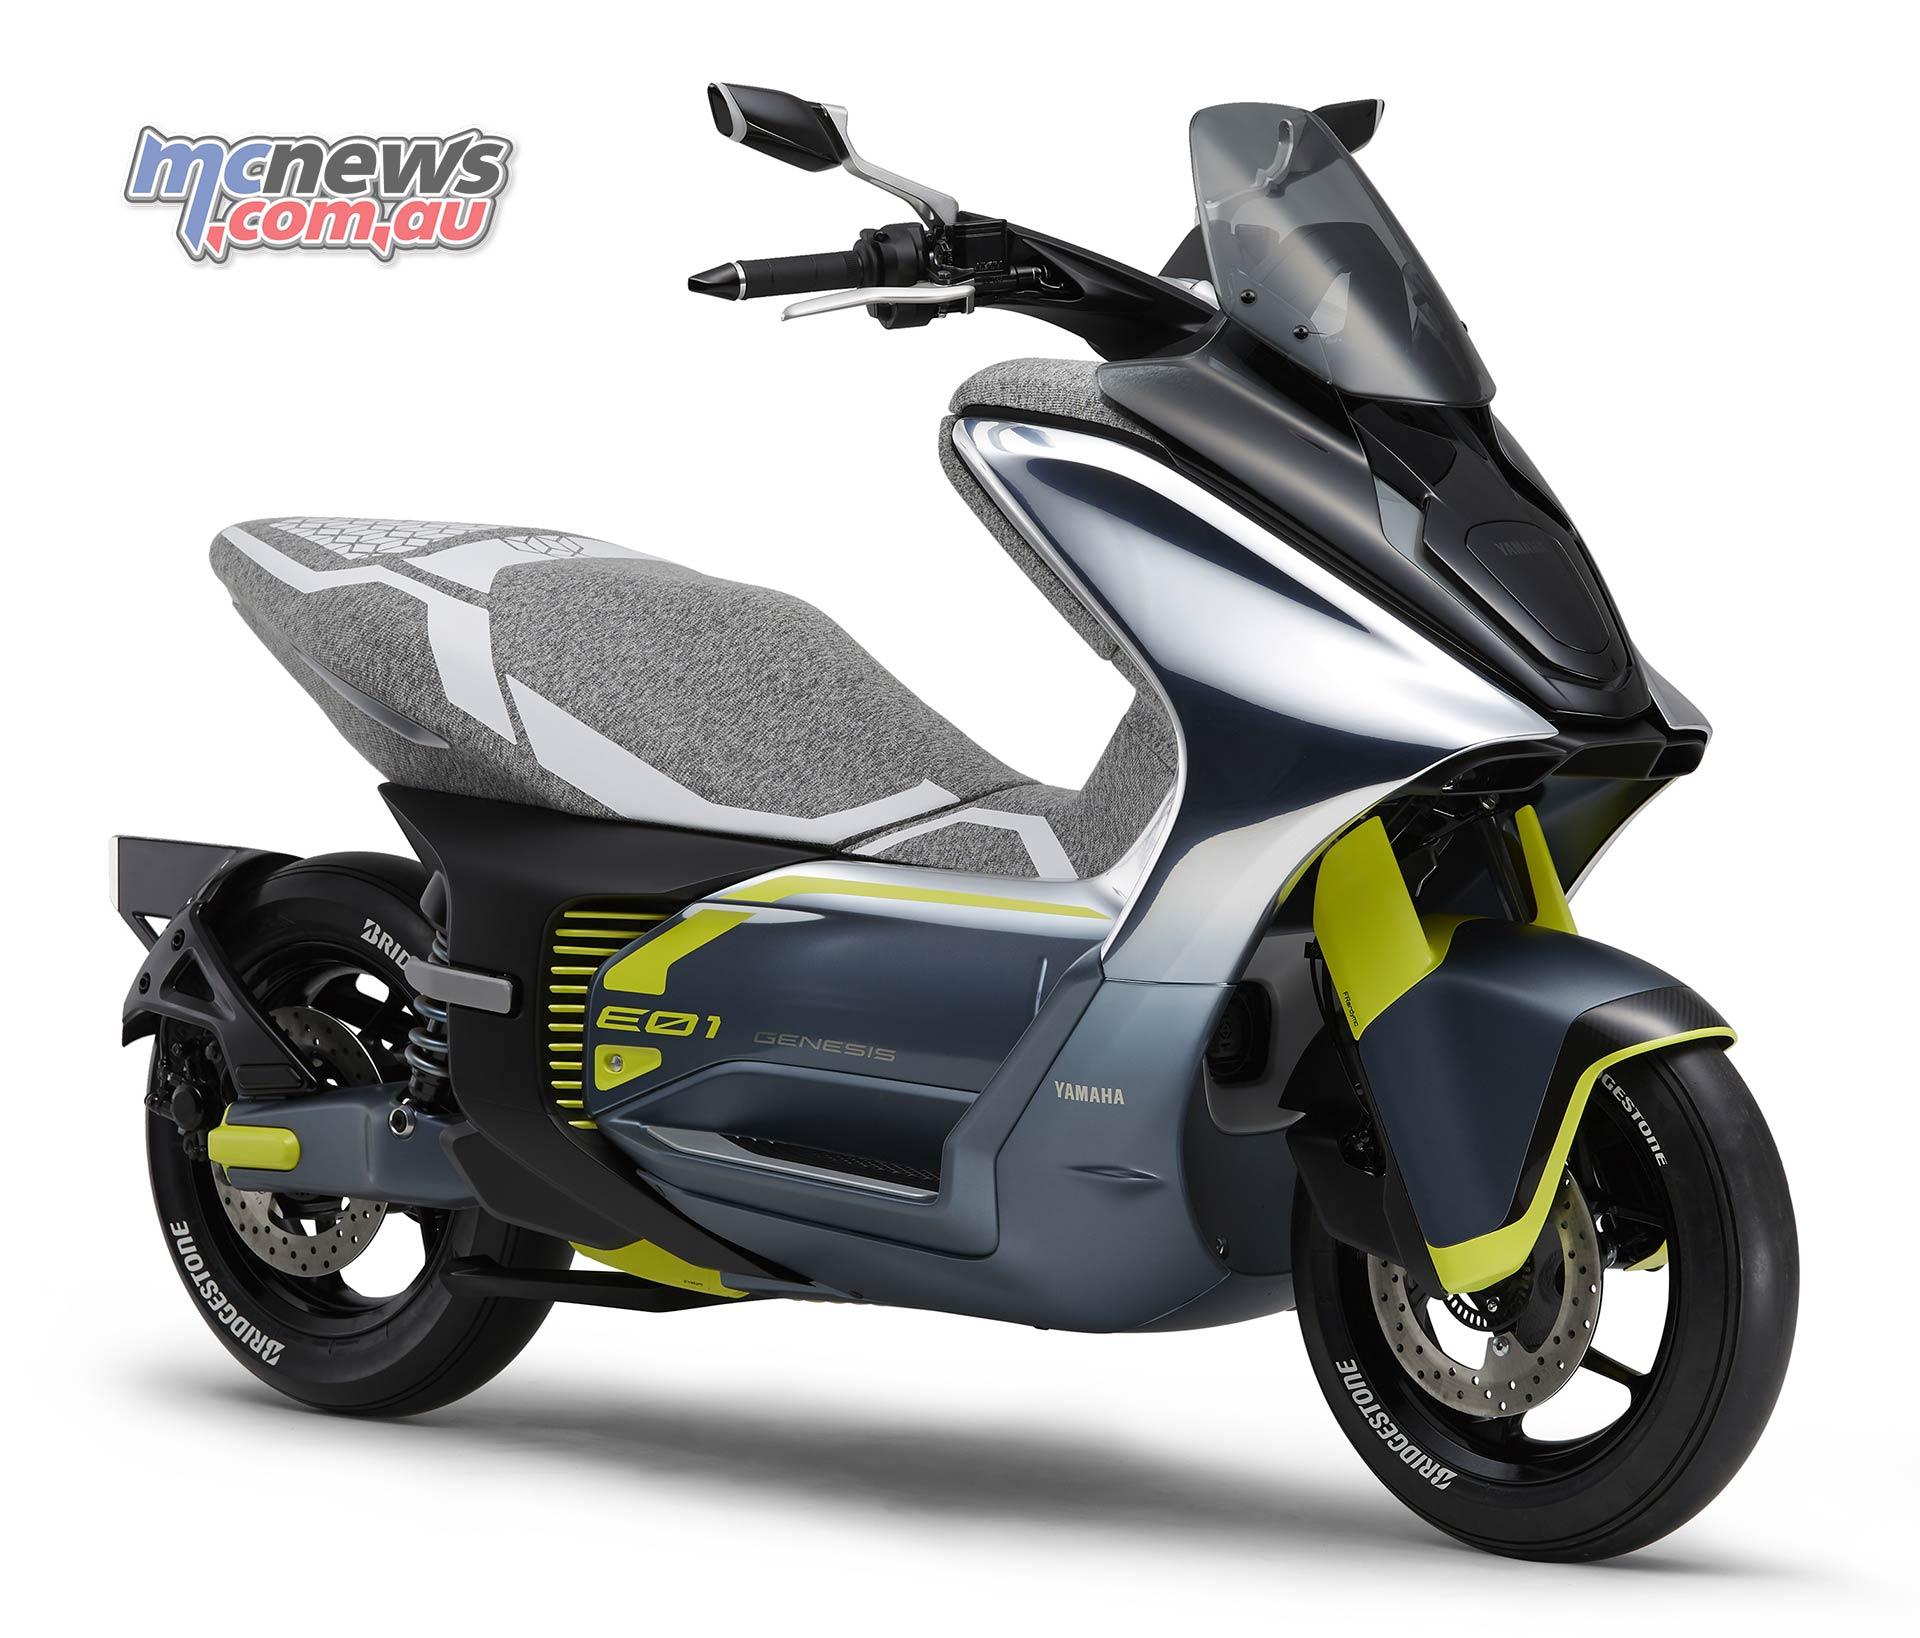 Yamaha focus on mobility at Tokyo Motor Show | MCNews.com ...